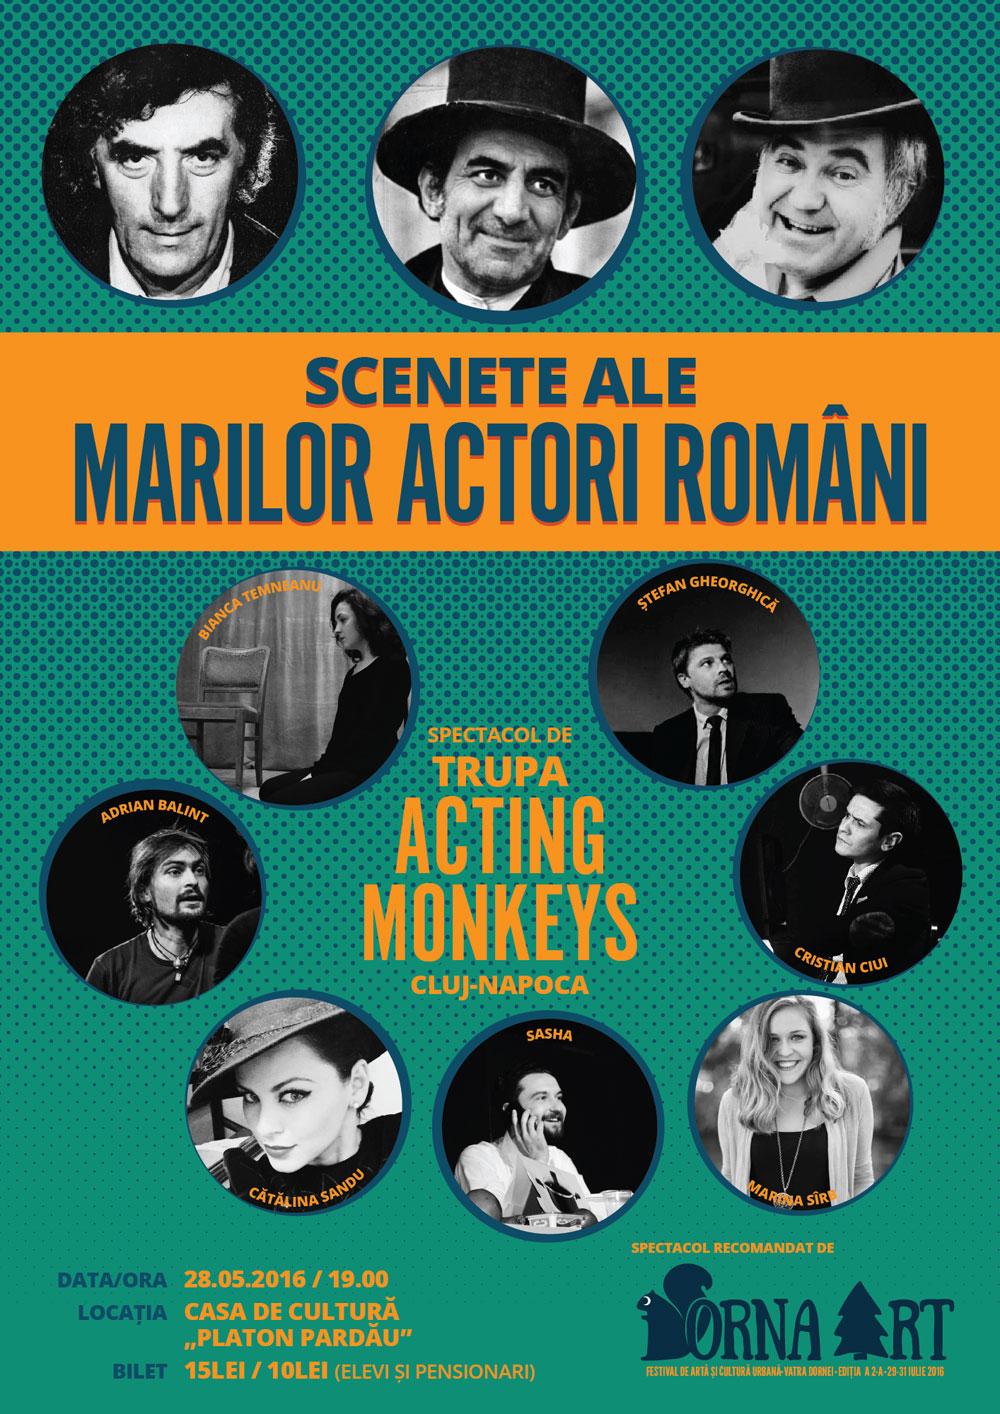 Scenete ale marilor actori români